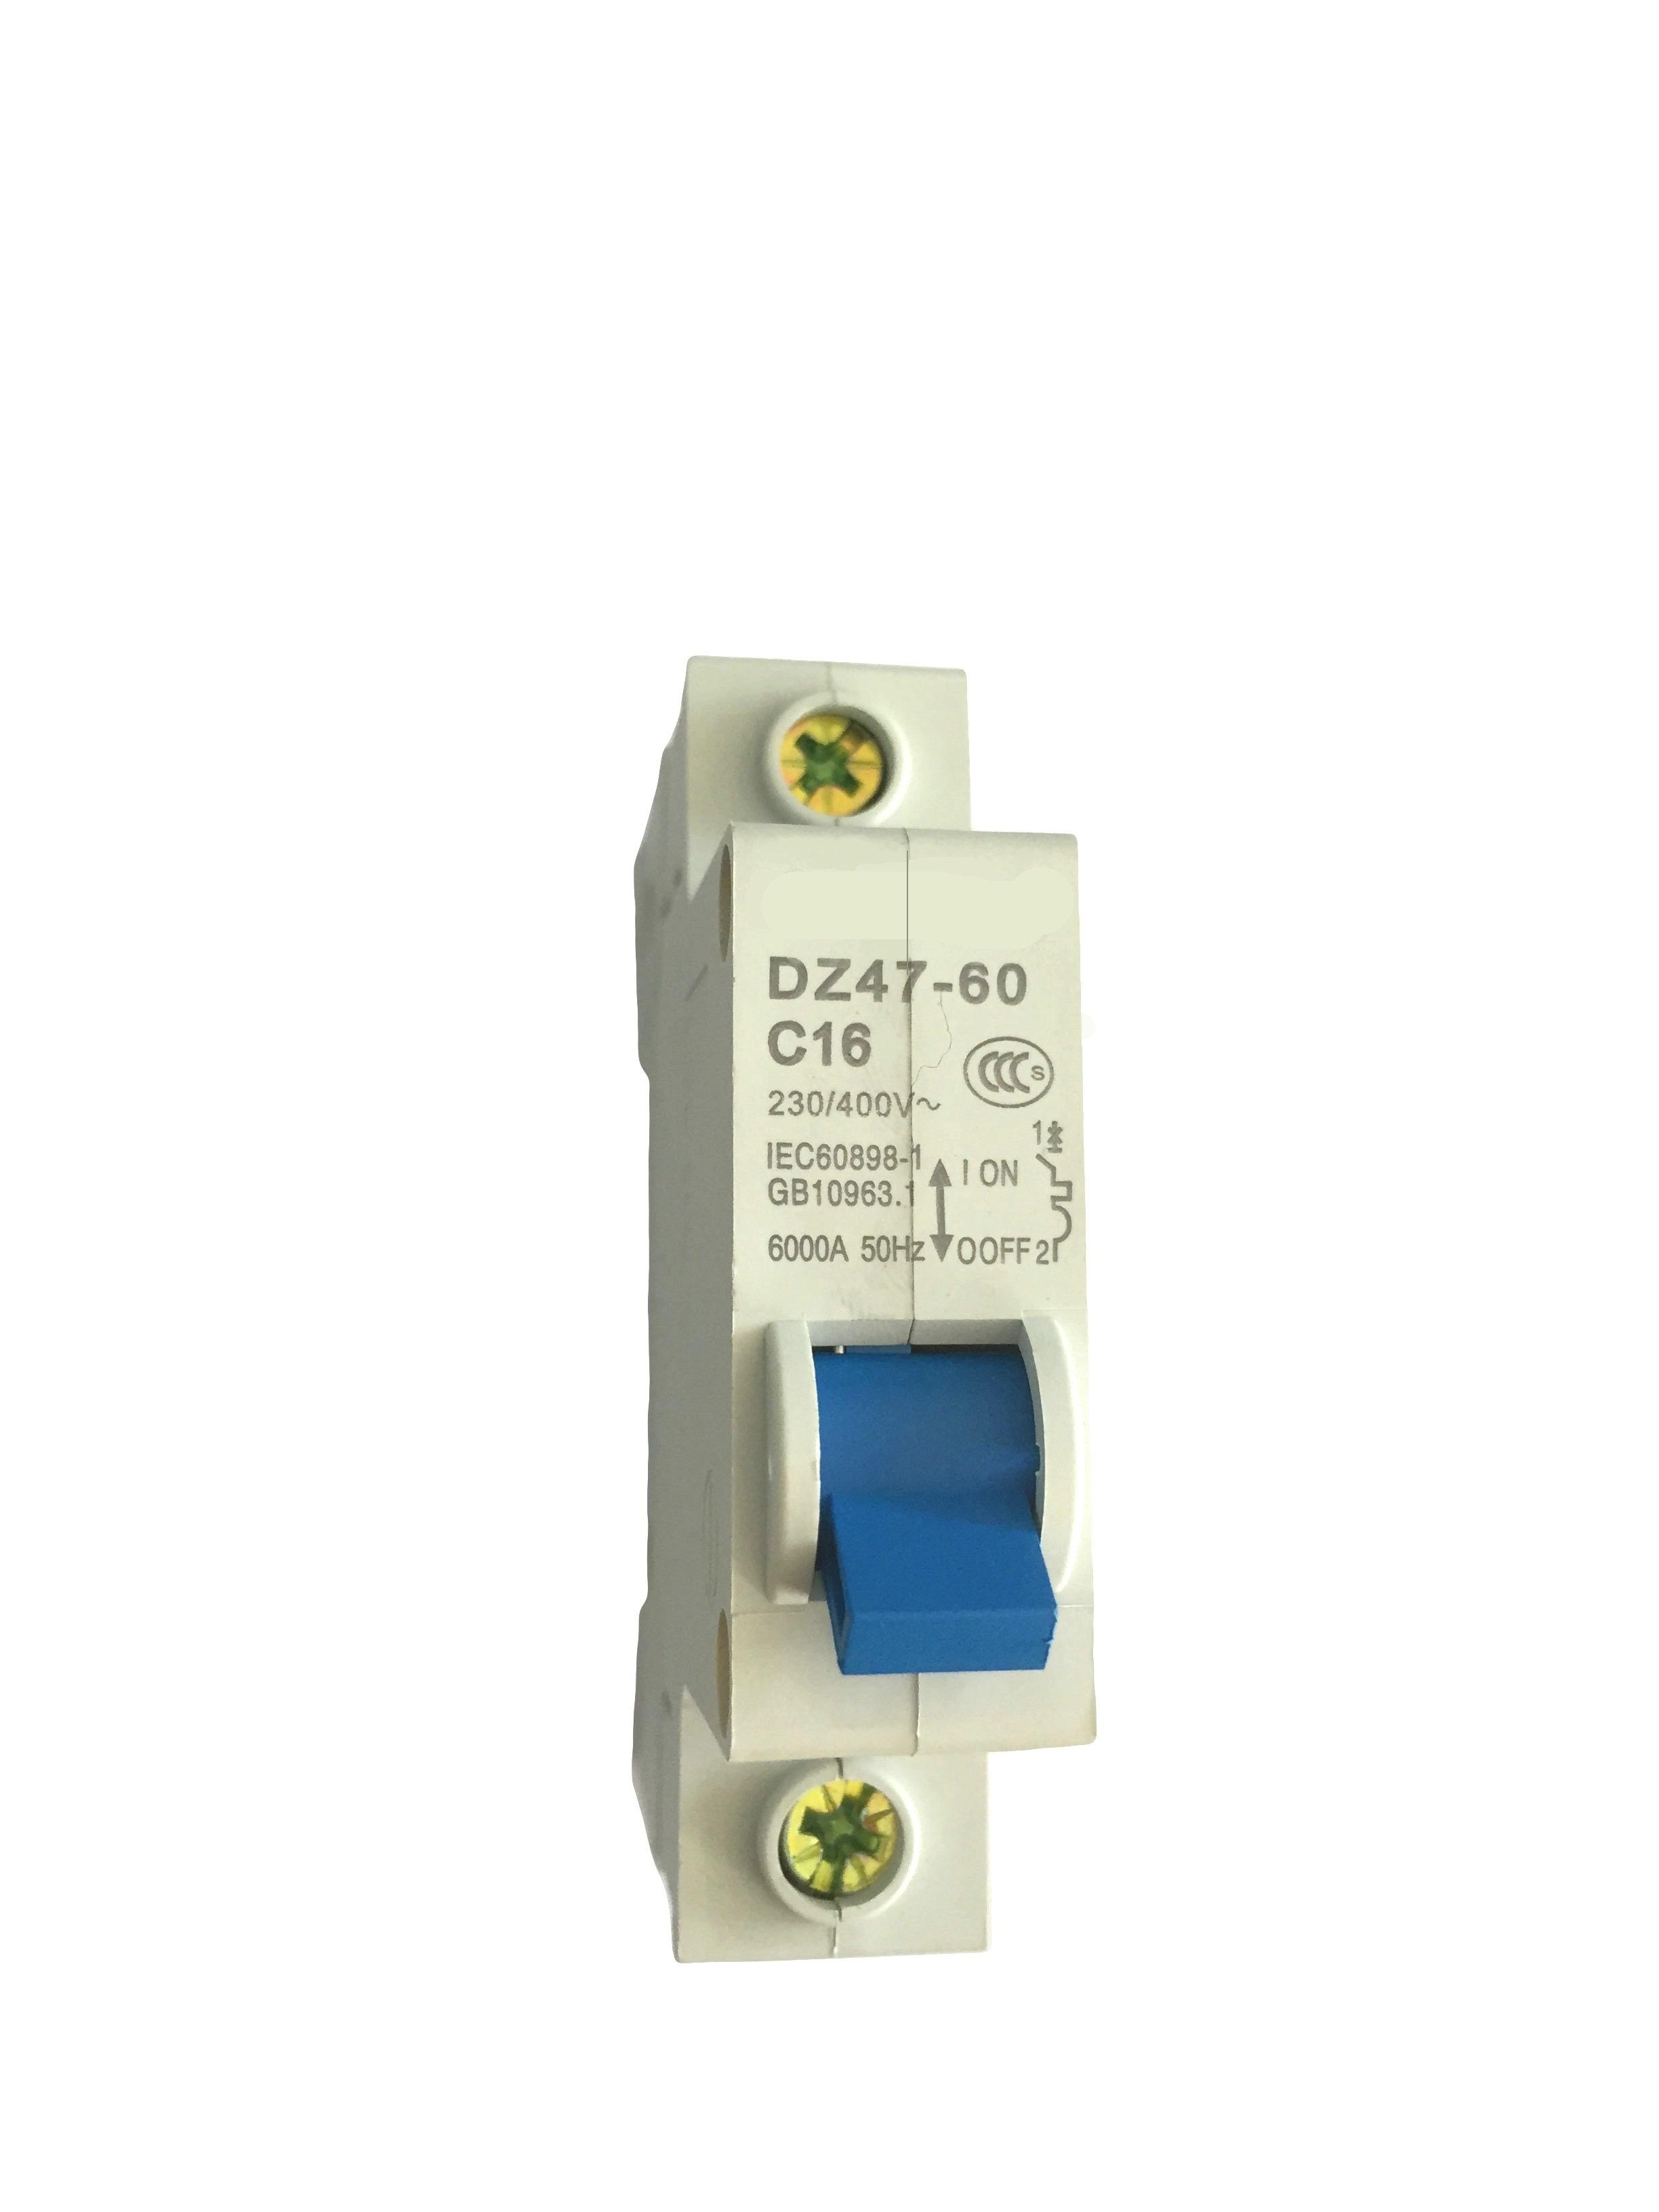 China Dz47 63 Mcb Circuit Breaker 1p 2p 3p 4pelectric House High Quality 4p